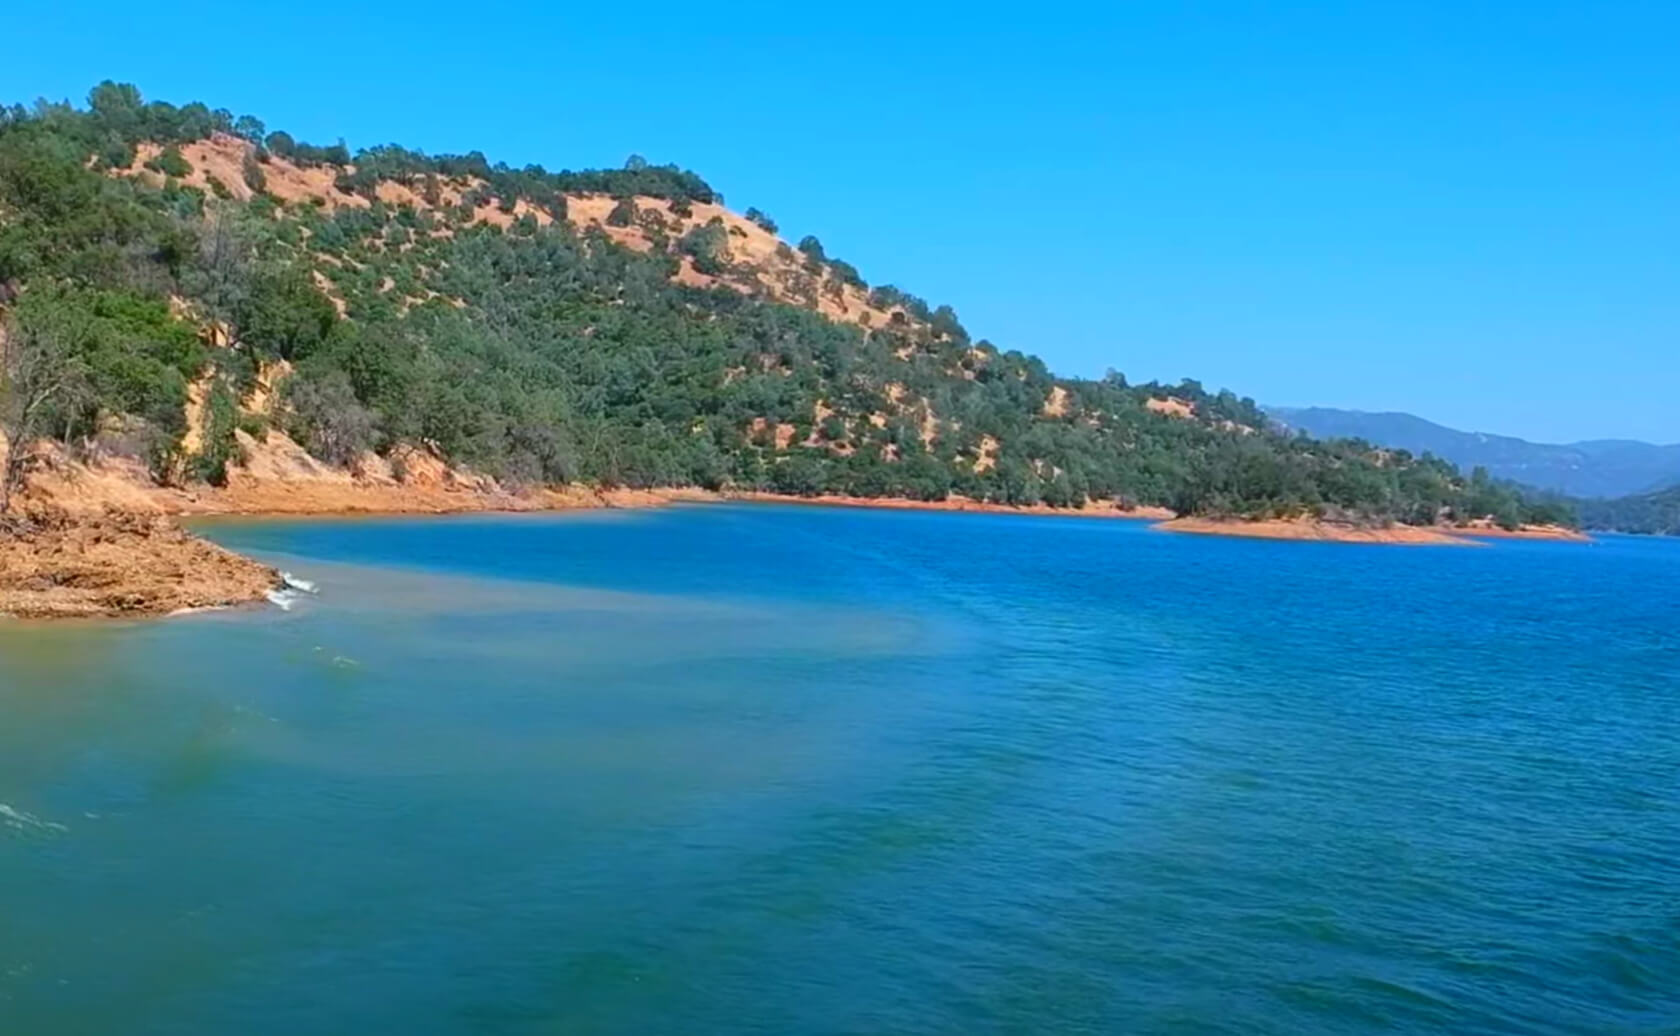 Don-Pedro-Lake-Fishing-Guide-Report-California-01